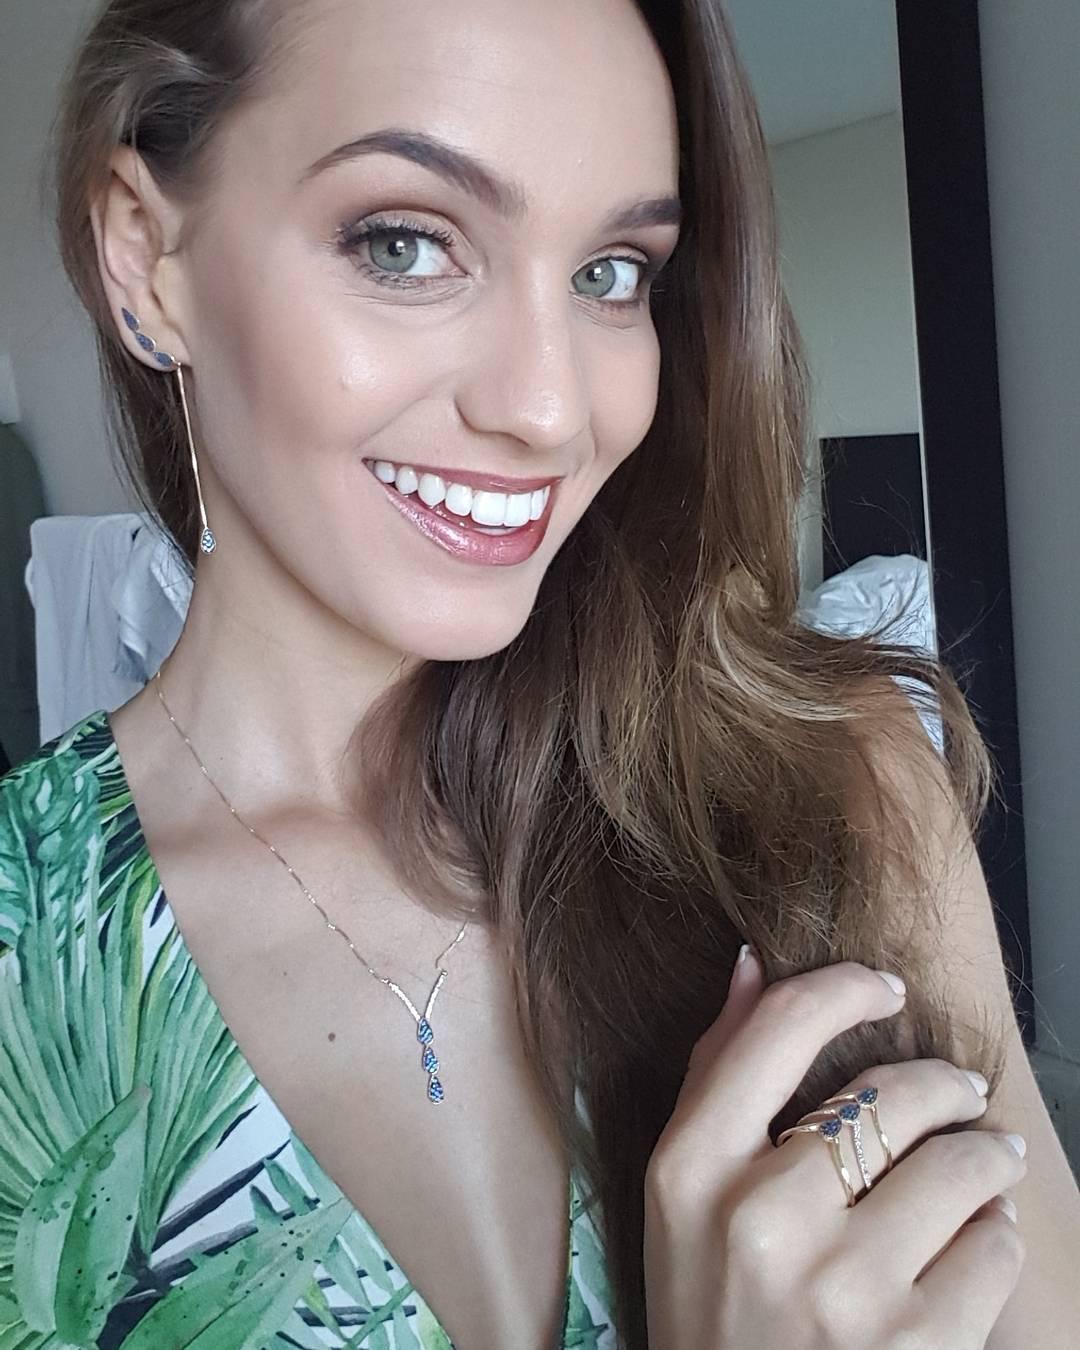 isabele pandini nogueira, miss grand rio de janeiro 2019/vice de reyna hispanoamericana 2018/top 4 de miss global beauty queen 2016. - Página 2 Ipvoztpu